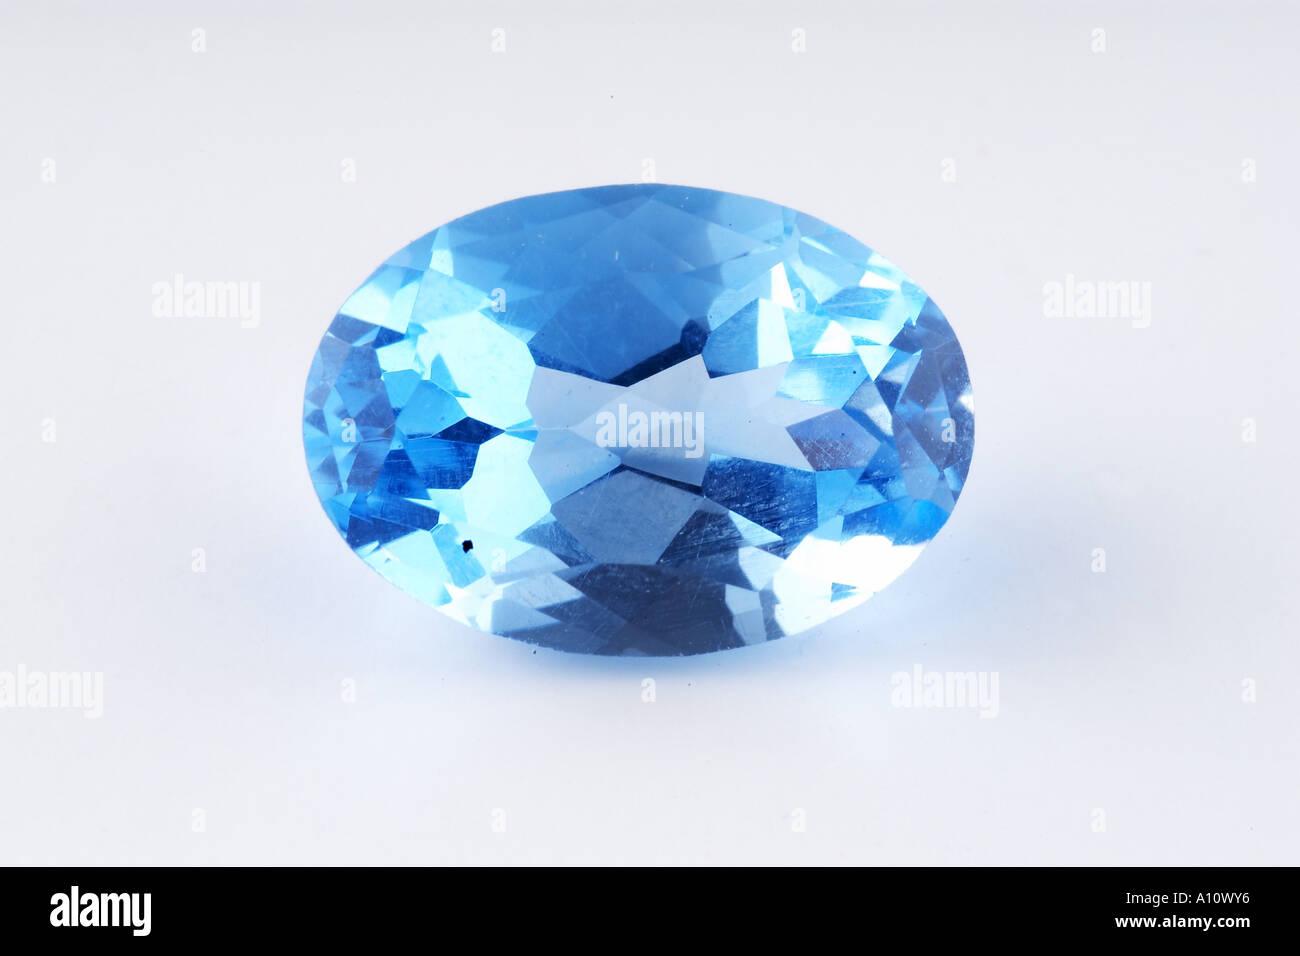 Blue Quartz one piece Semi Precious Stone expensive cut facet shining glitter on white background in studio tabletop stilllife - Stock Image